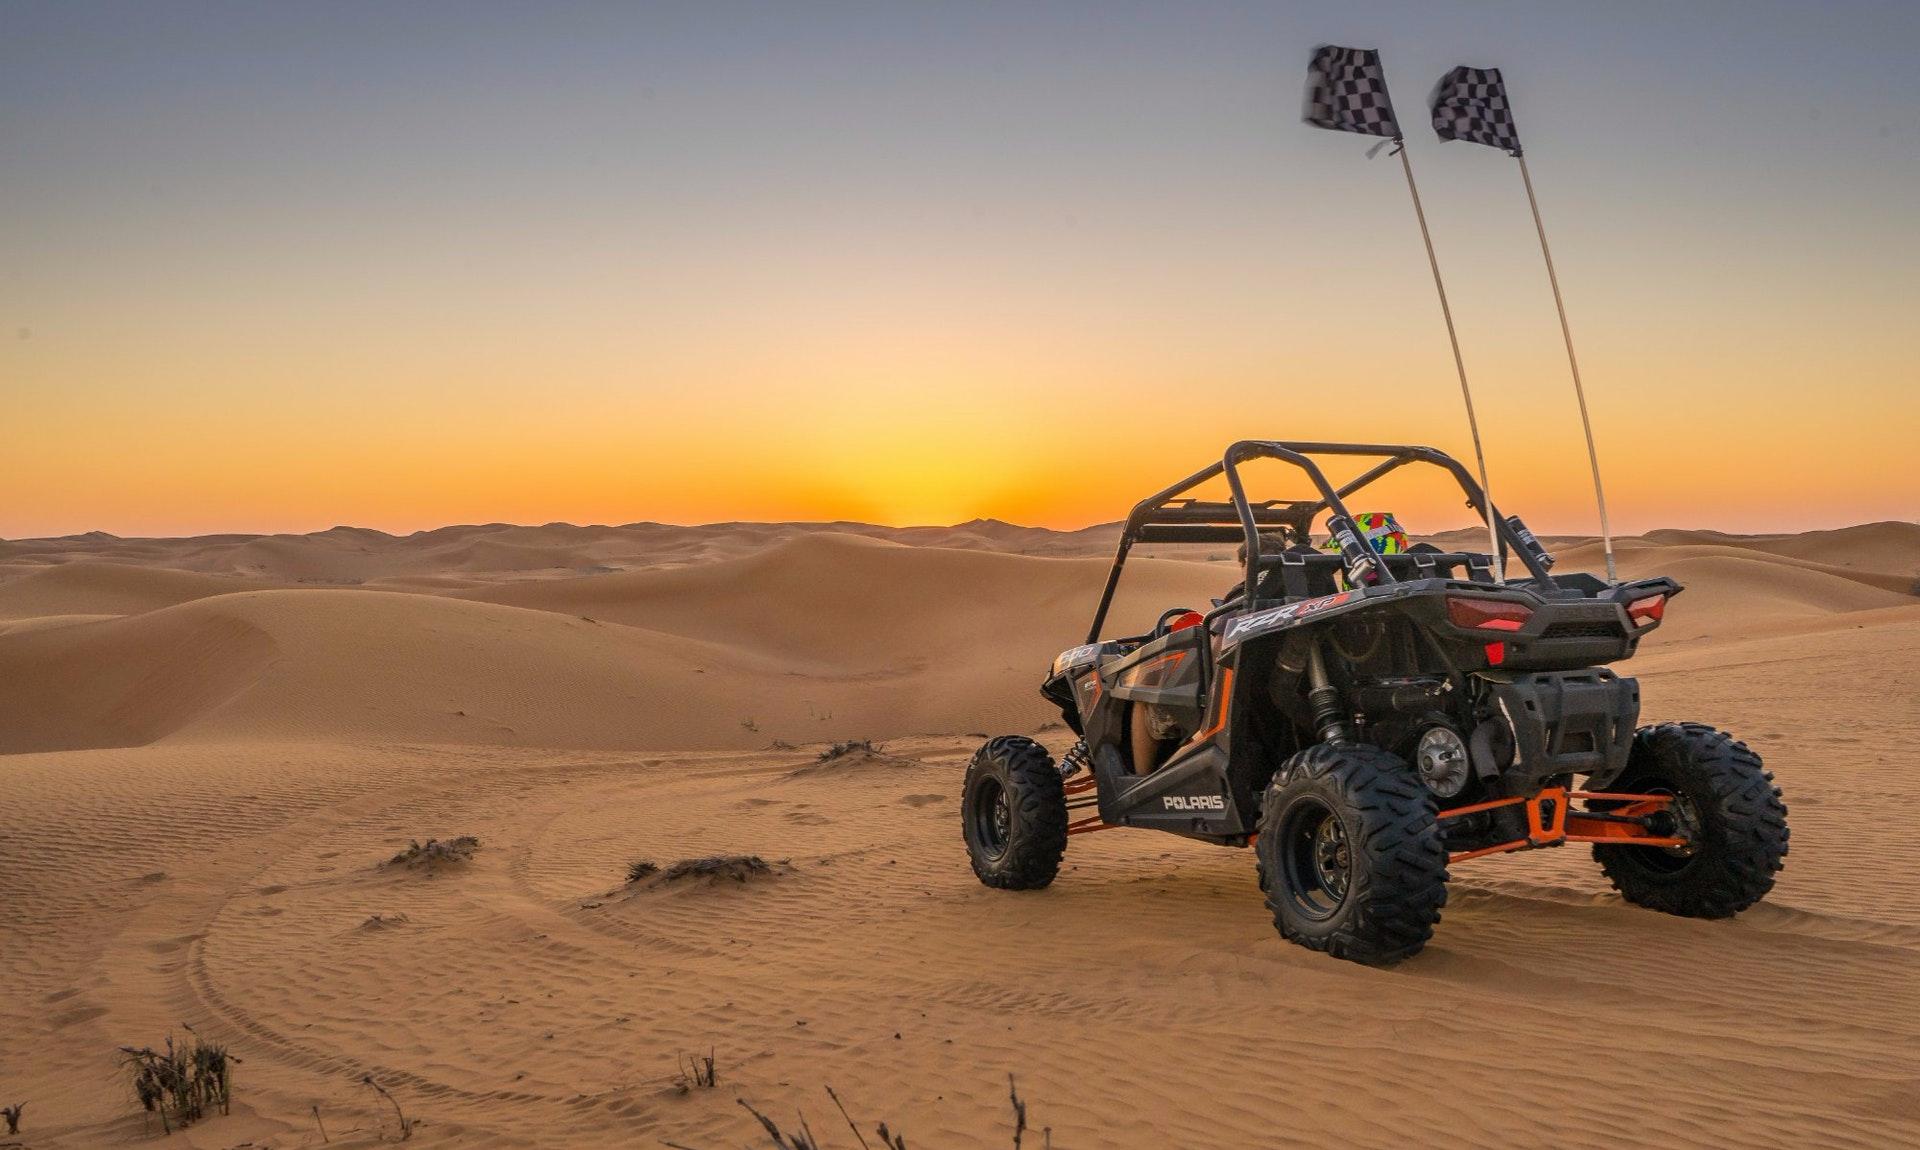 Dune buggy riding